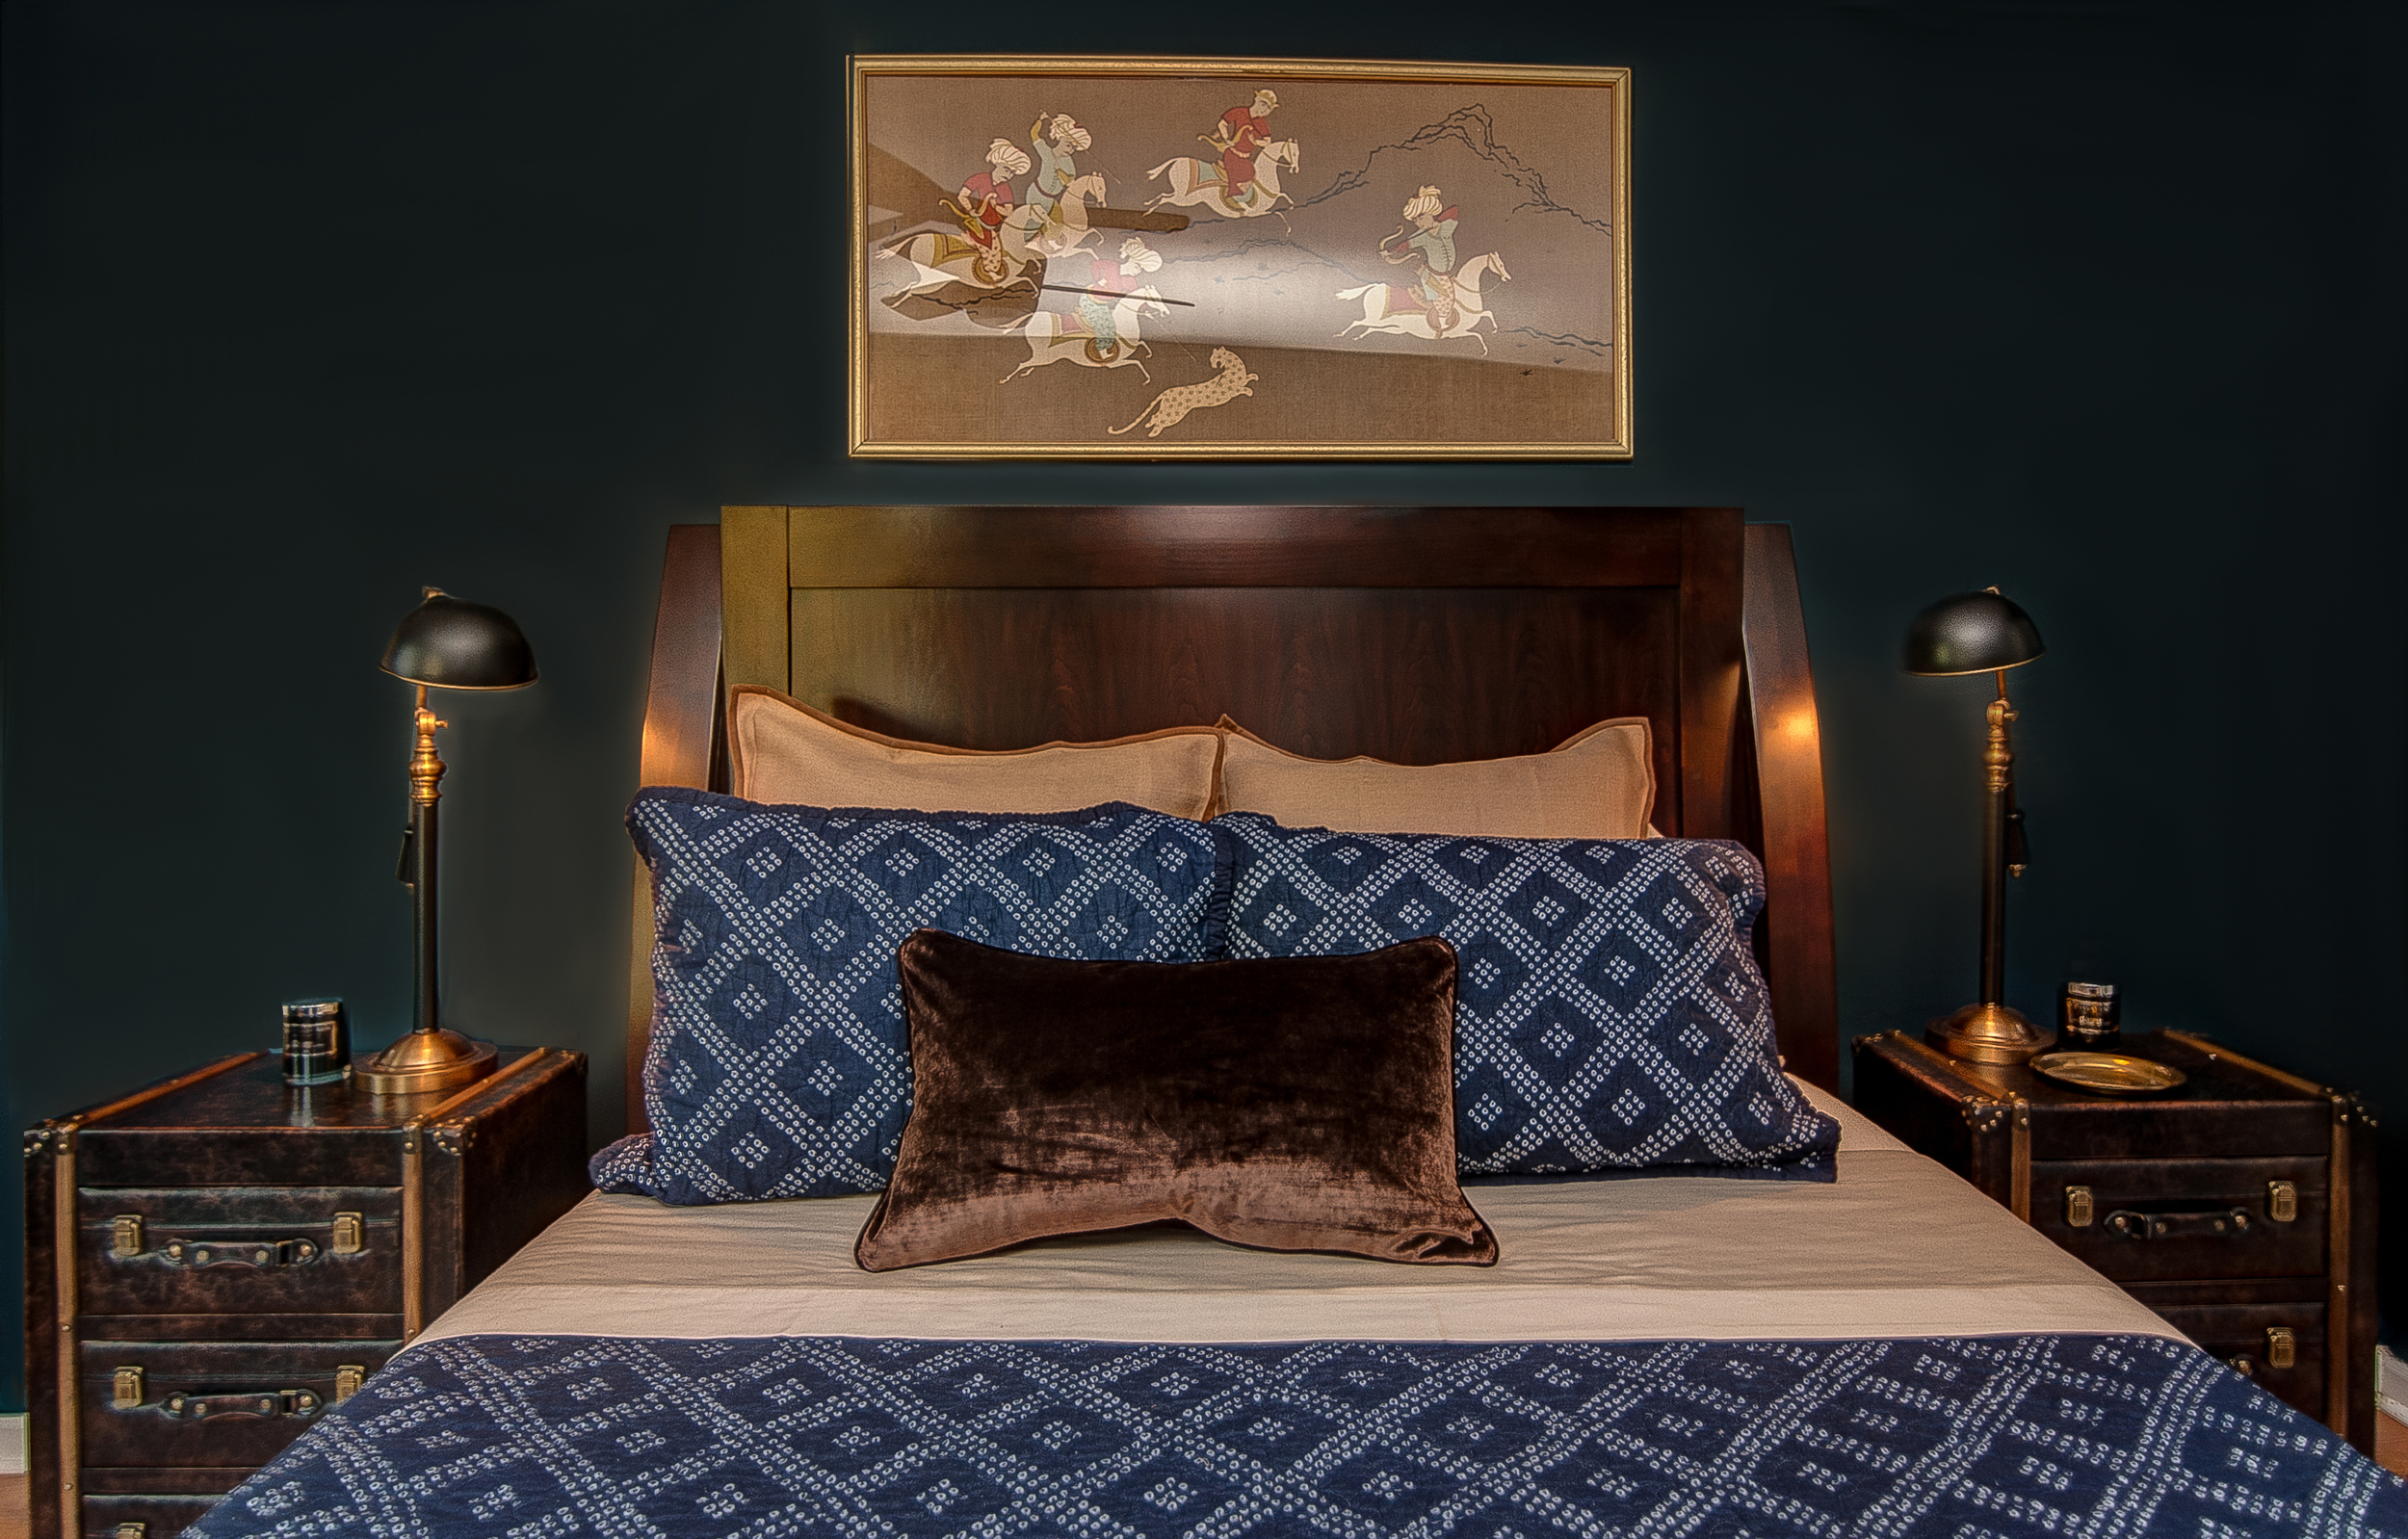 Artful Interiors - Bachelor Pad - Master Bedroom 2